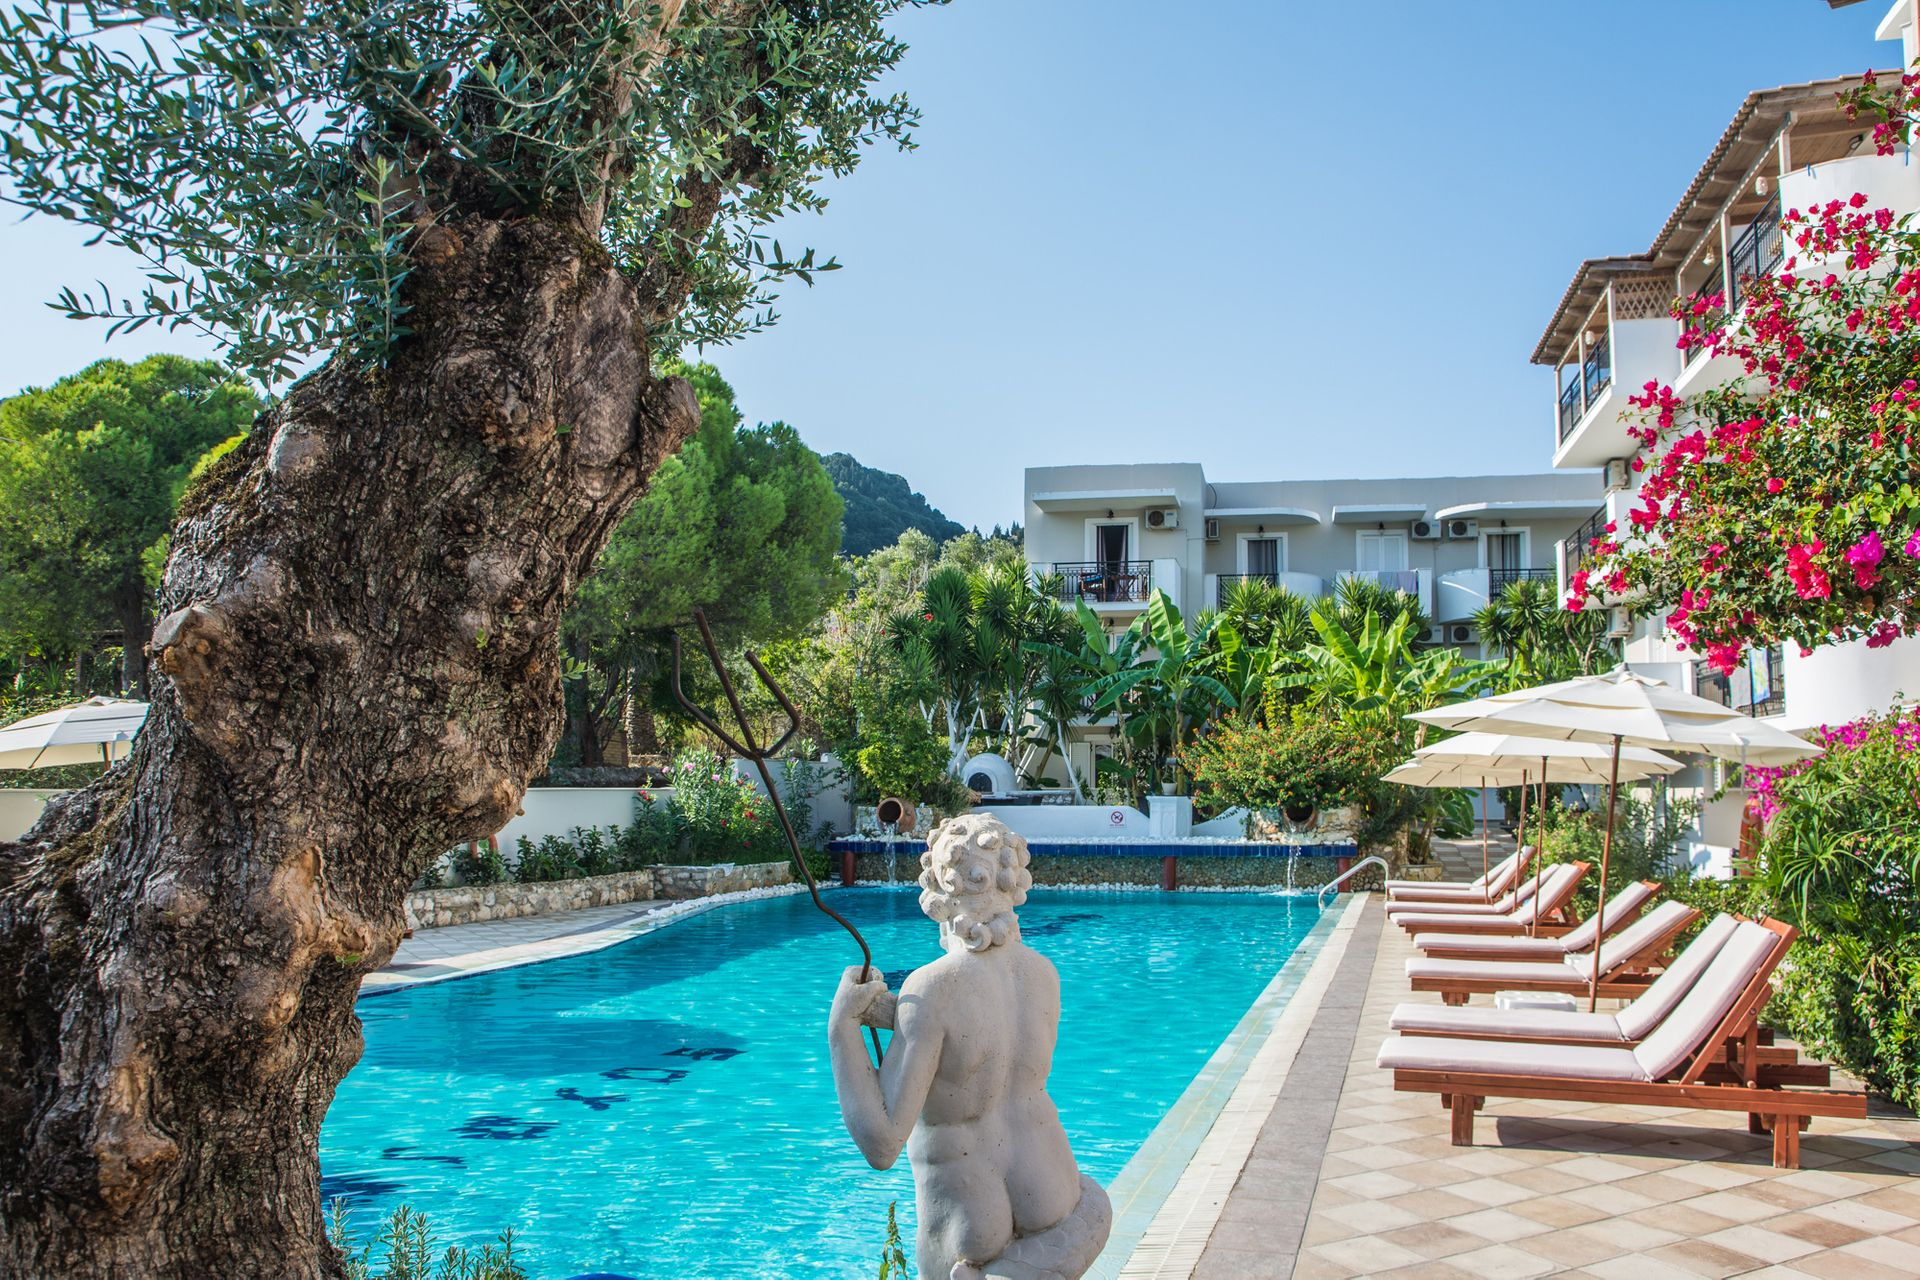 Iniohos Hotel Zakynthos - Ζάκυνθος ✦ -20% ✦ 3 Ημέρες